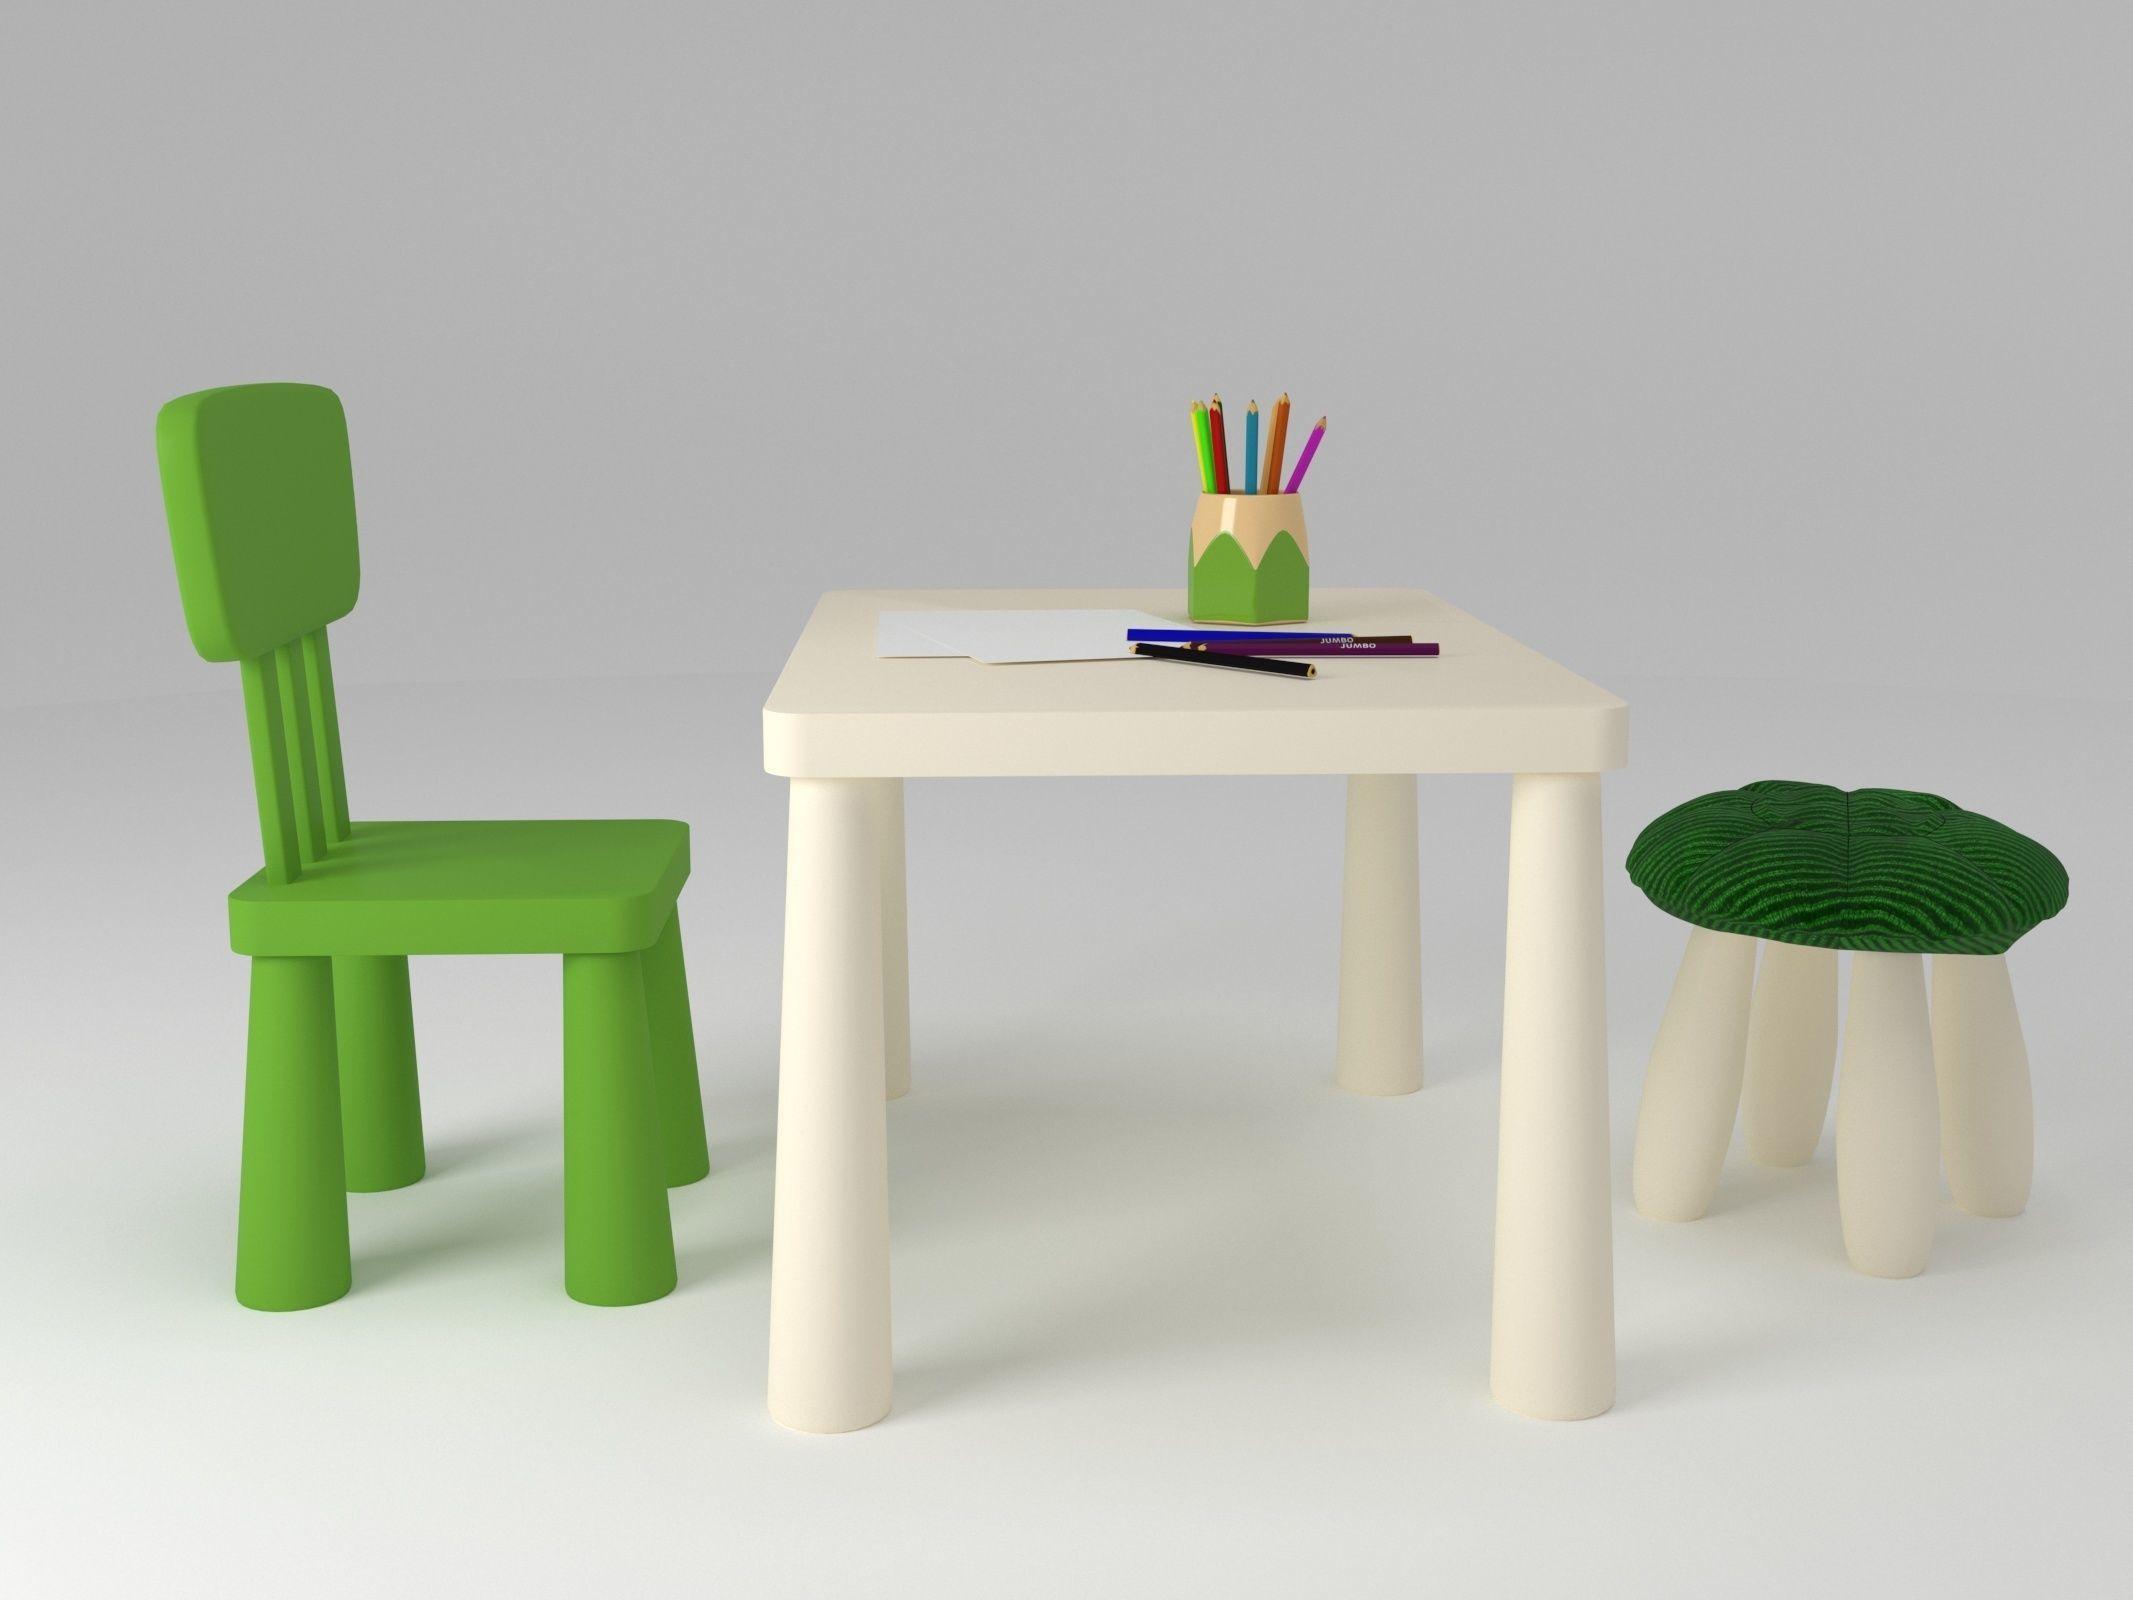 3d Ikea Mammut Furniture Set Model 3d Model Max Obj 3ds Fbx